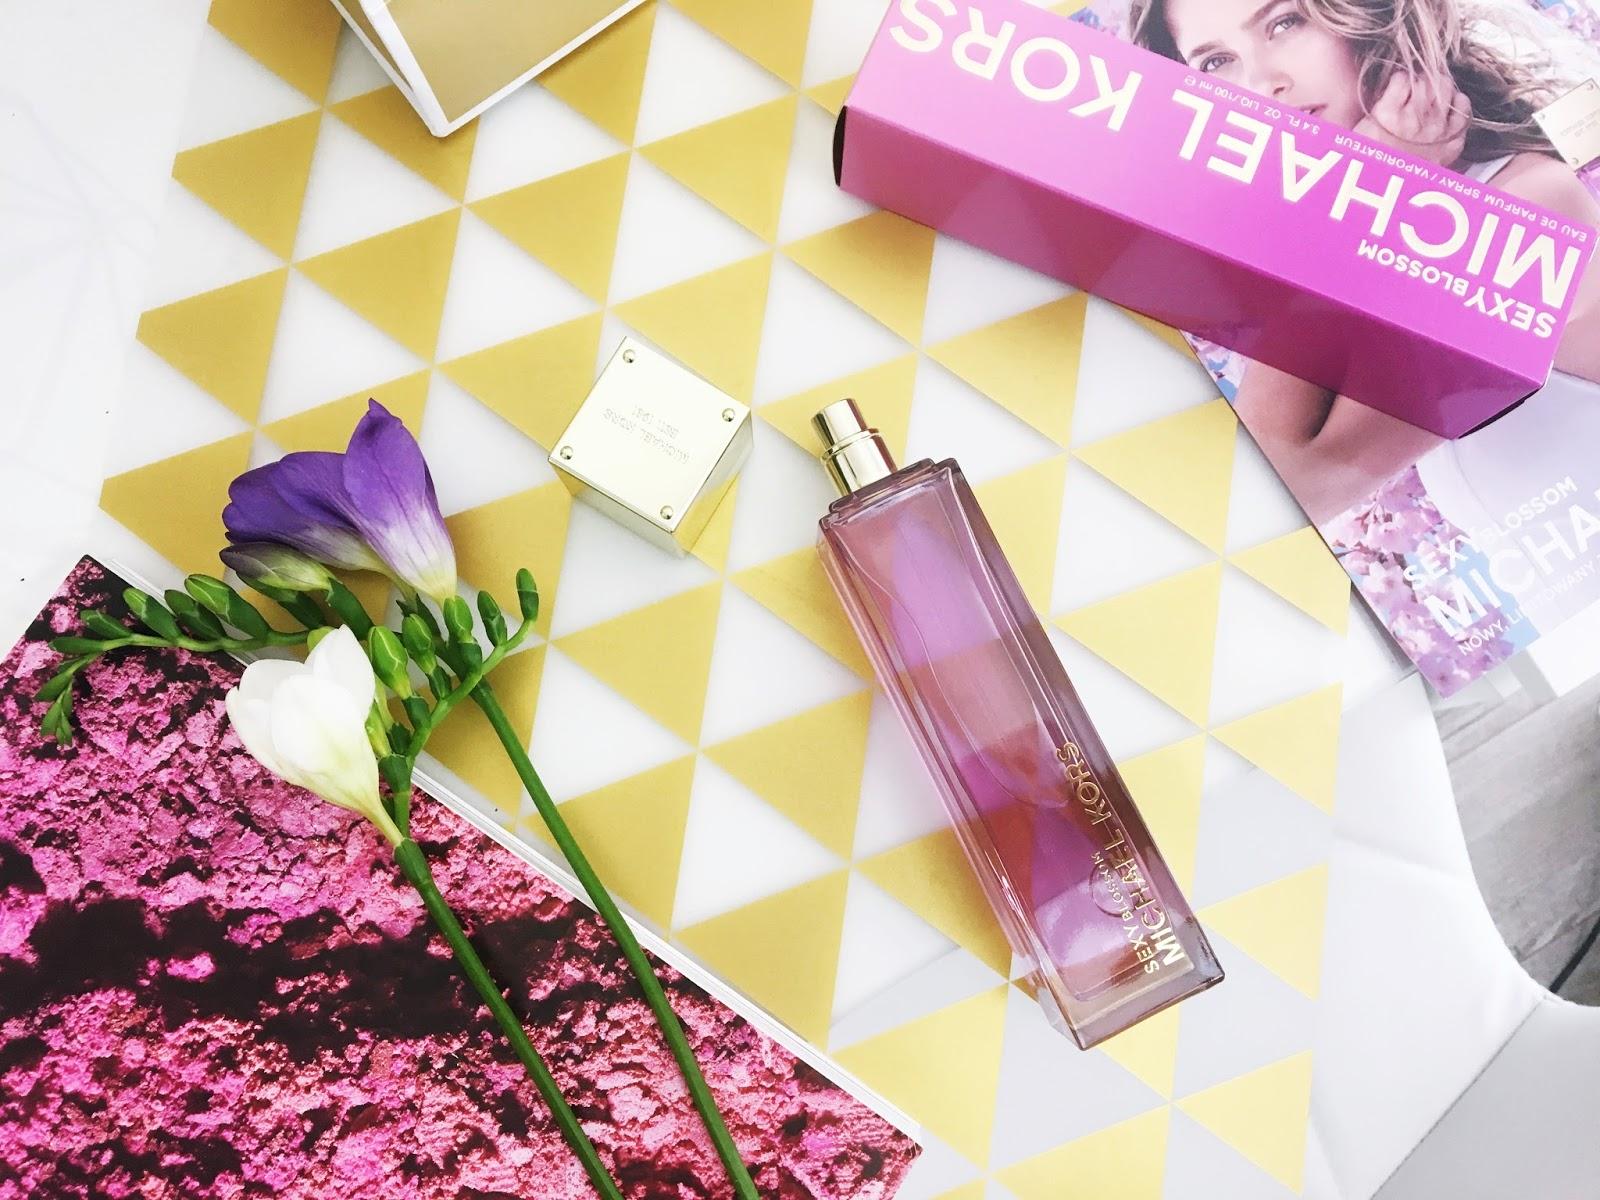 Sexy Blossom od Michael Kors